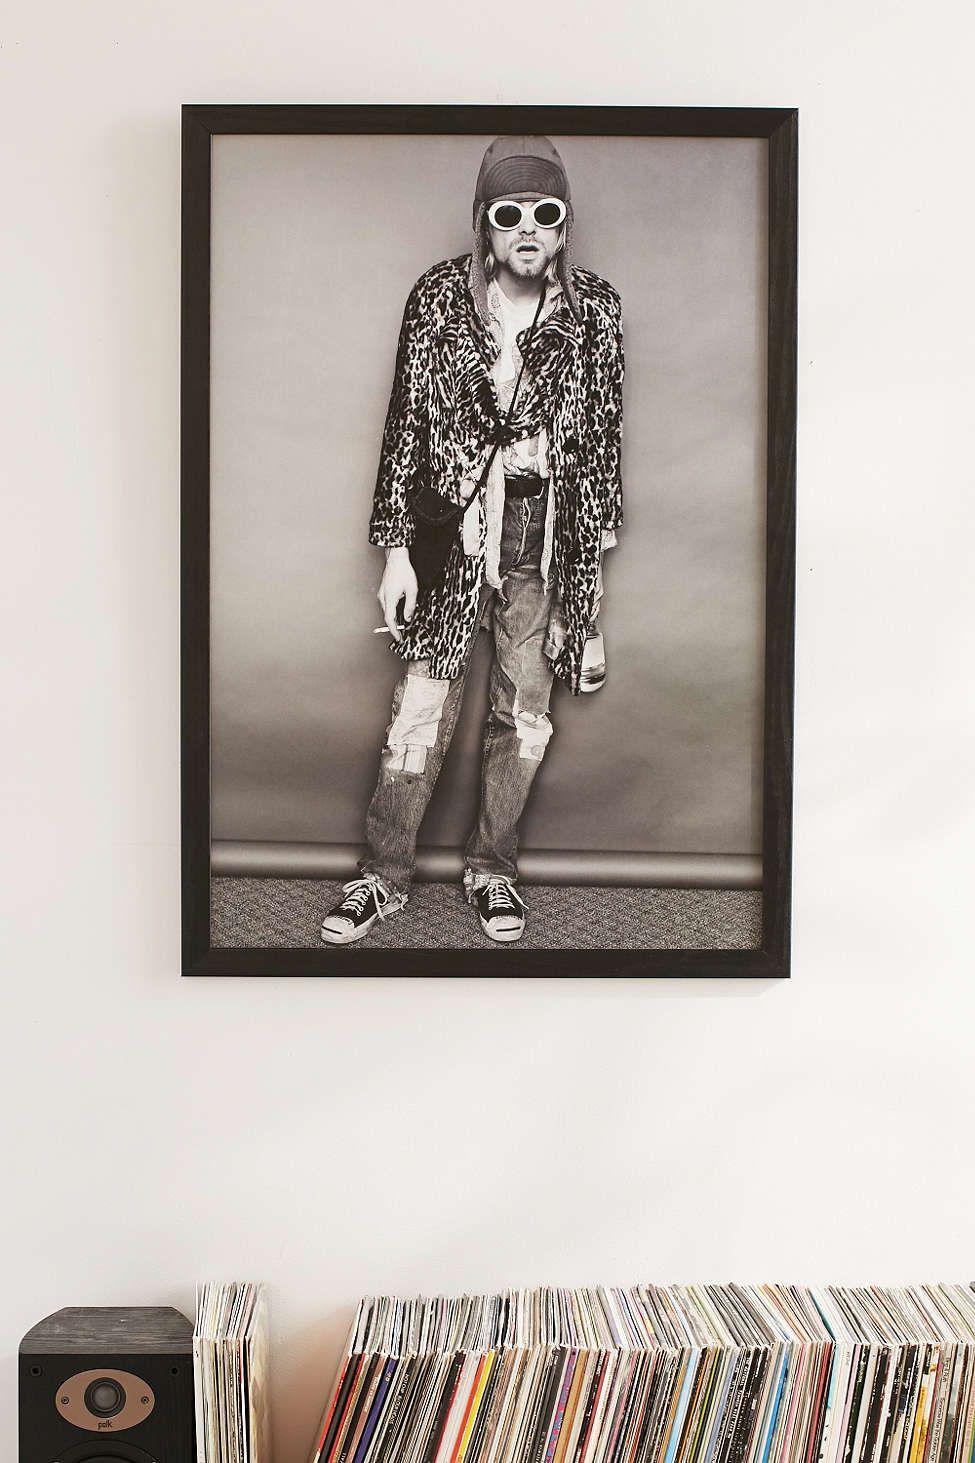 Black + White Kurt Cobain Framed Art Print